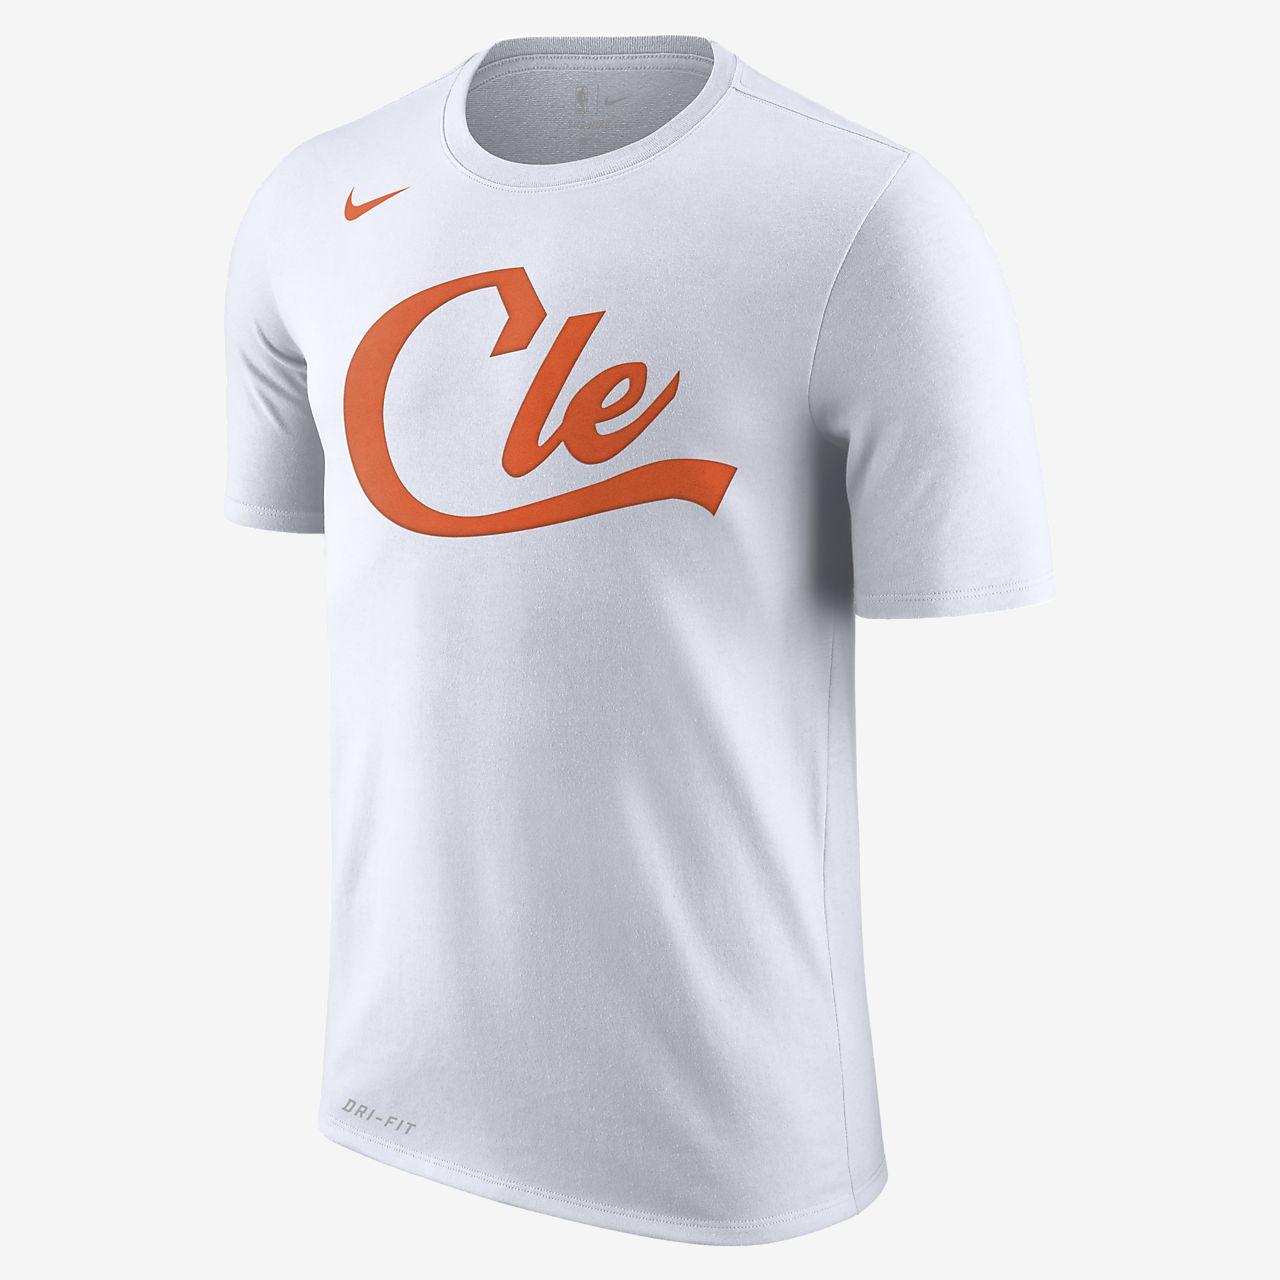 Tee Cleveland Nike Edition Shirt Dri City Fit Nba Pour Cavaliers PiOZkTXu